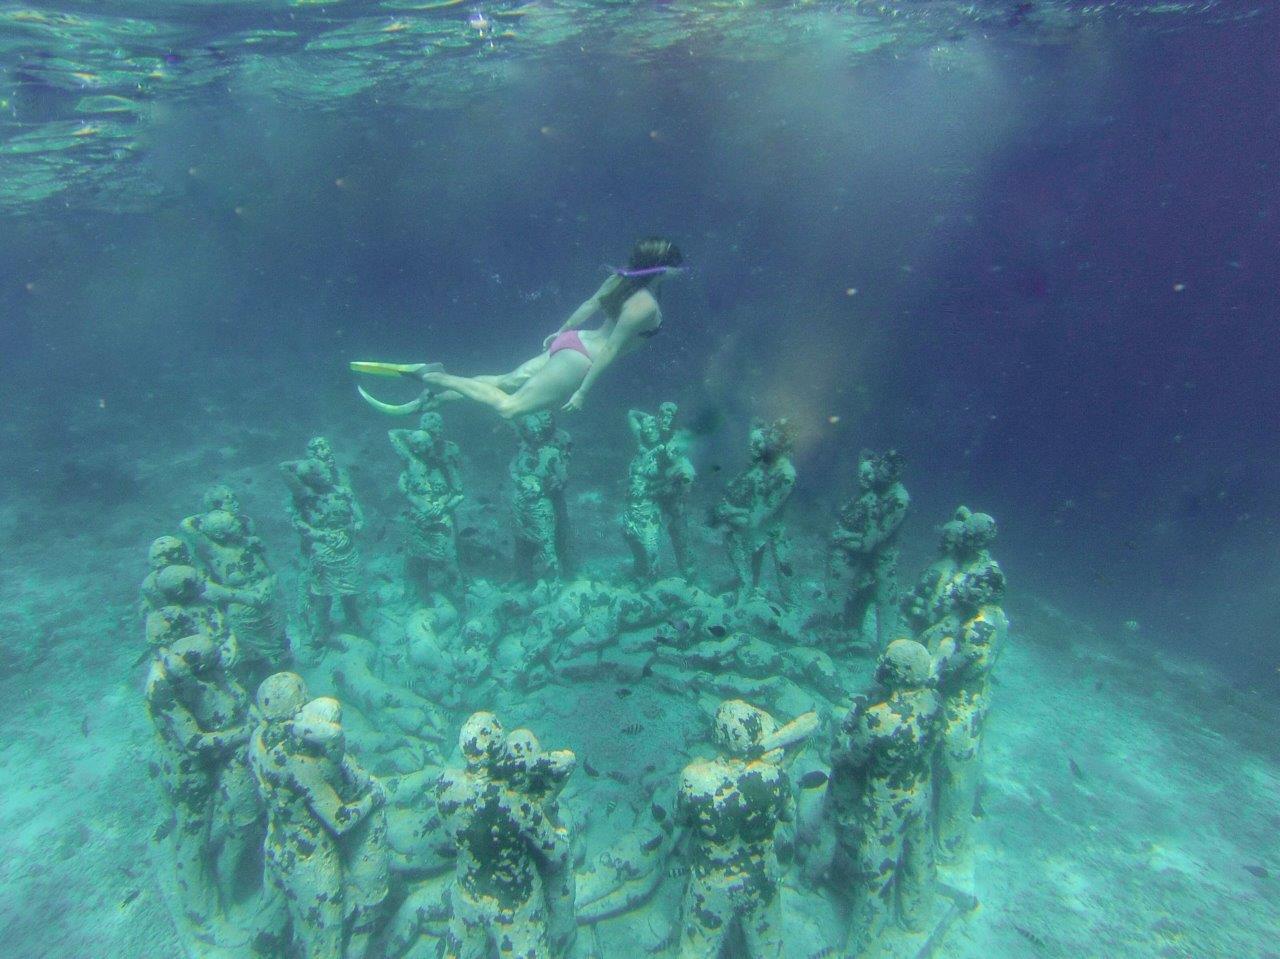 Snorkeling the Gili Islands